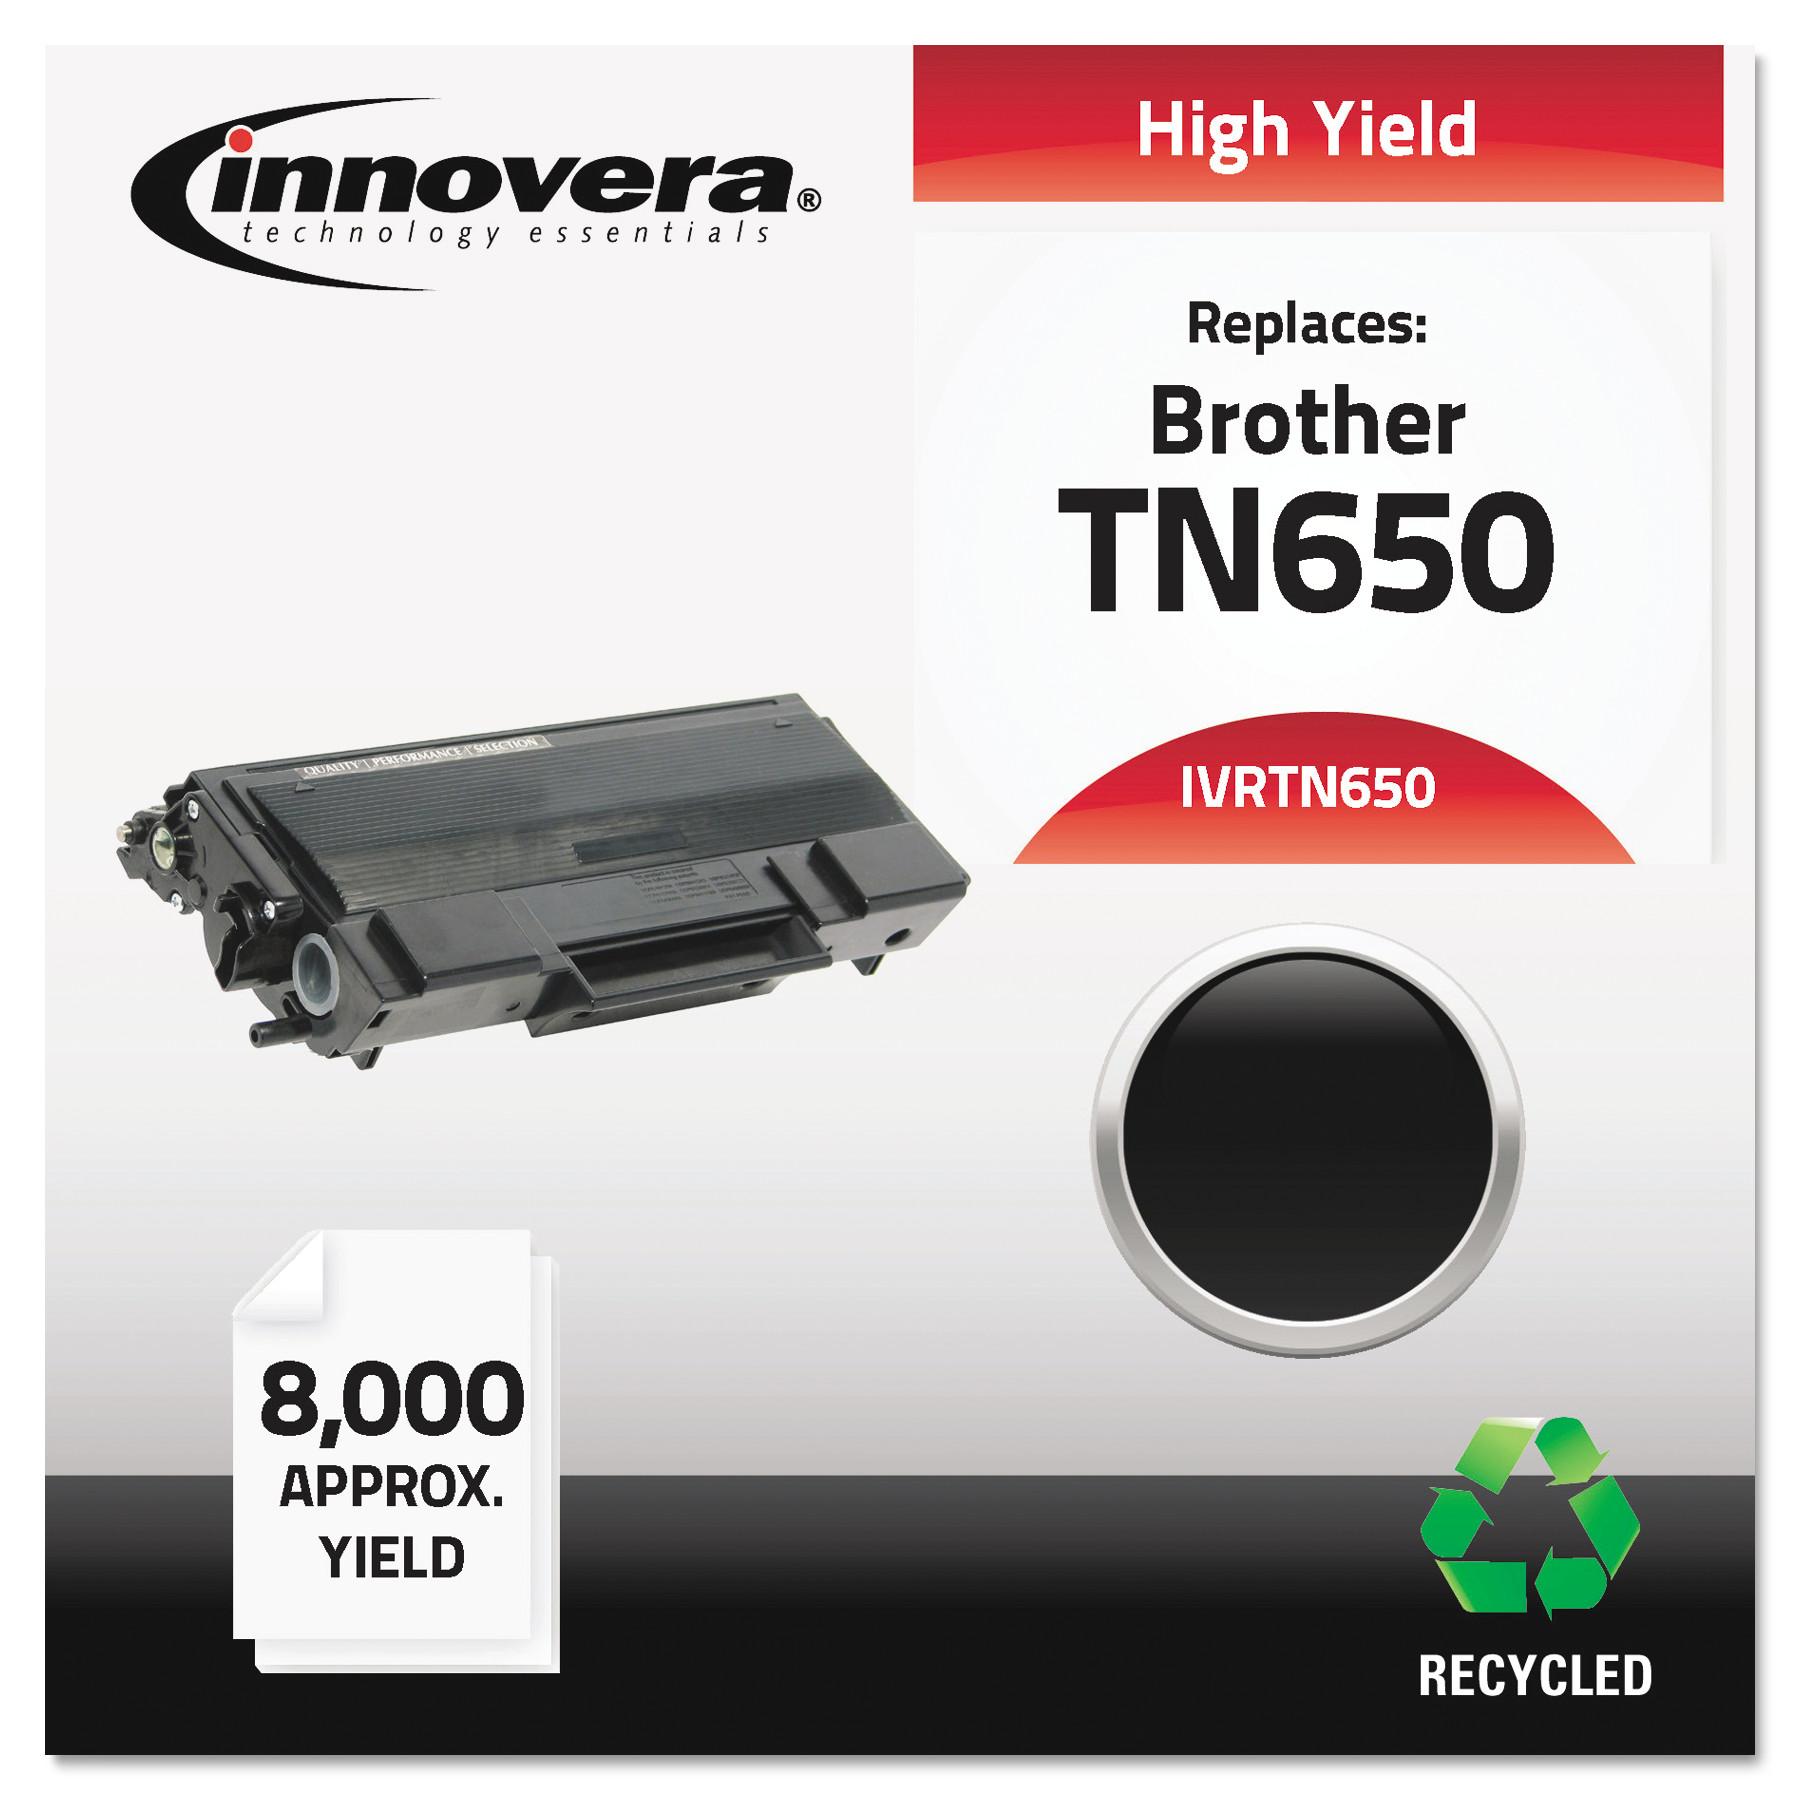 Innovera Remanufactured TN650 Laser Black Toner Cartridge